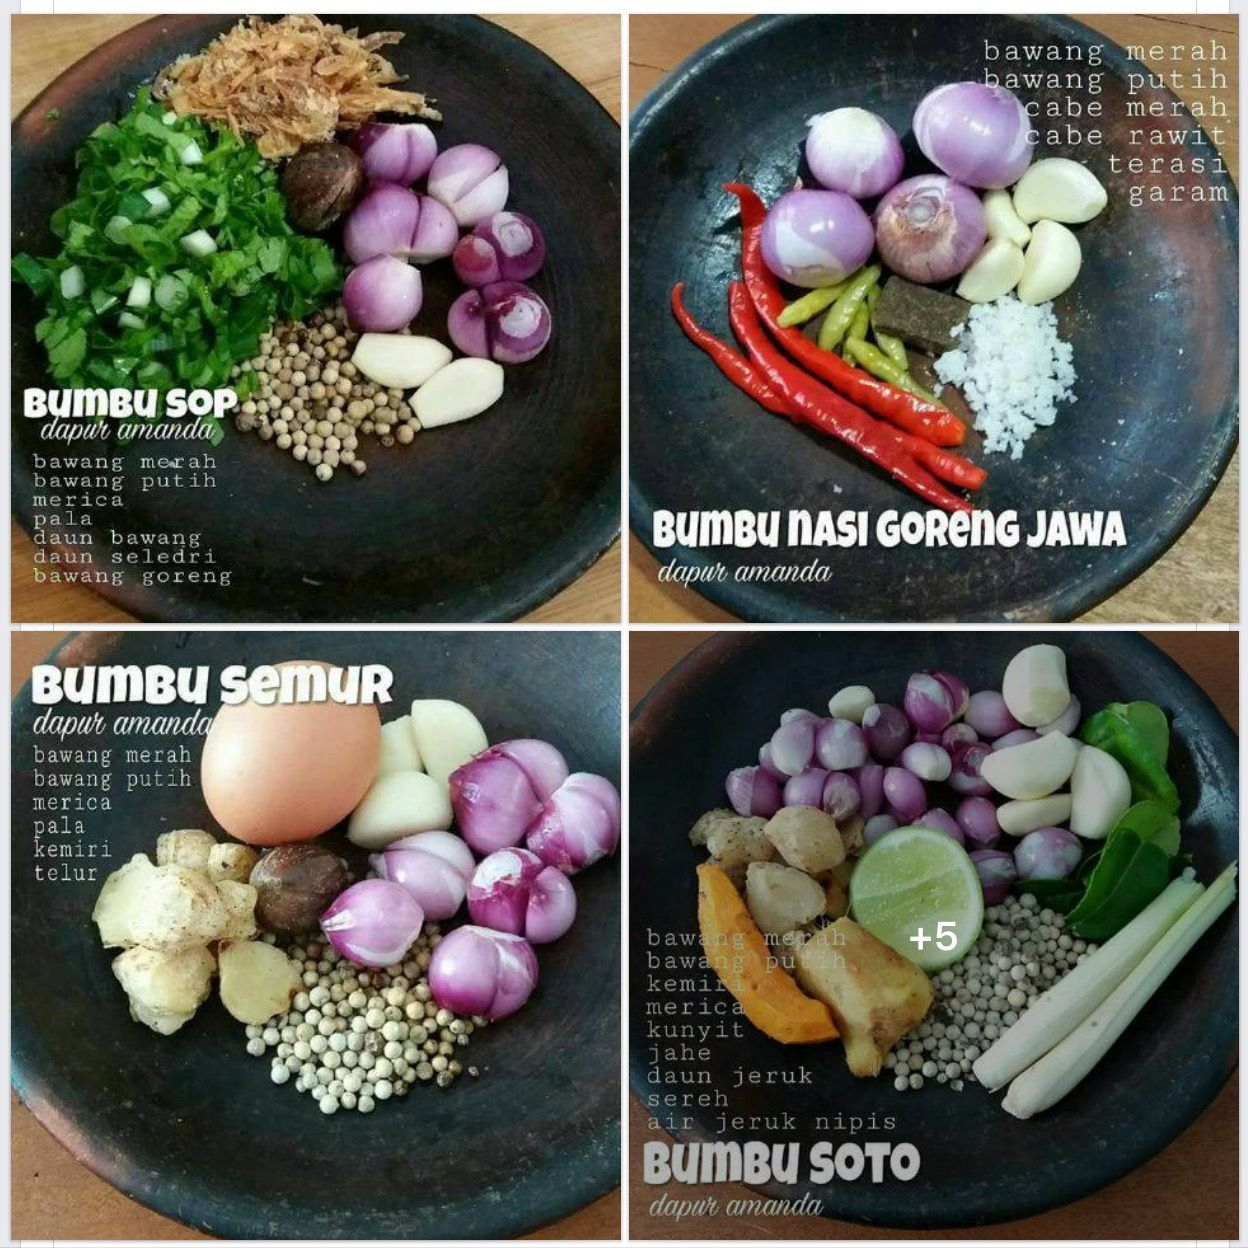 Bumbu Macam Ide Makanan Resep Makanan Asia Resep Makan Malam